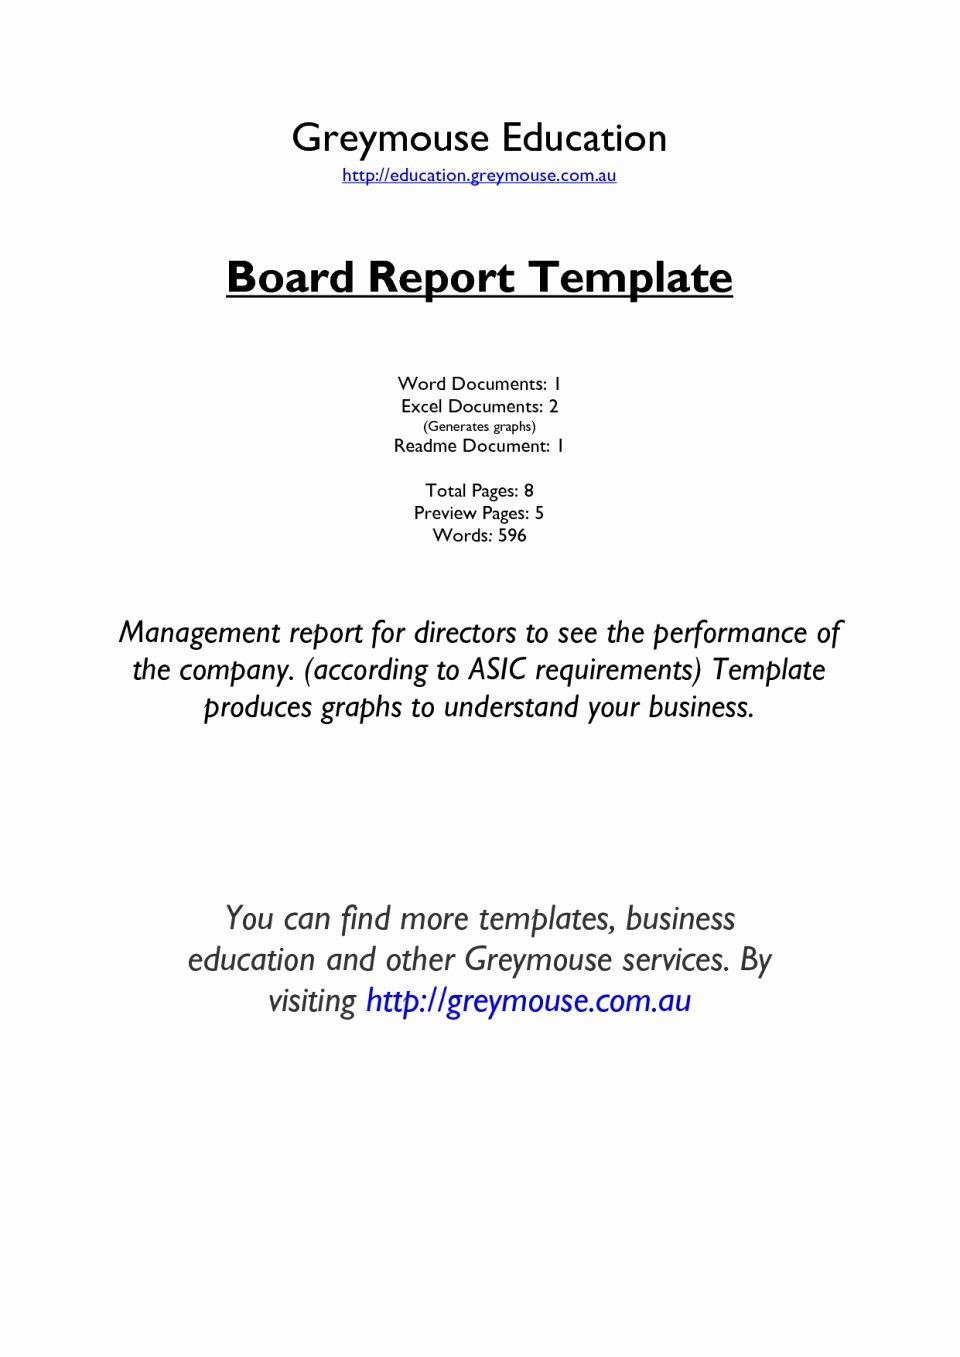 Board Of Directors Report Template New Board Report Template